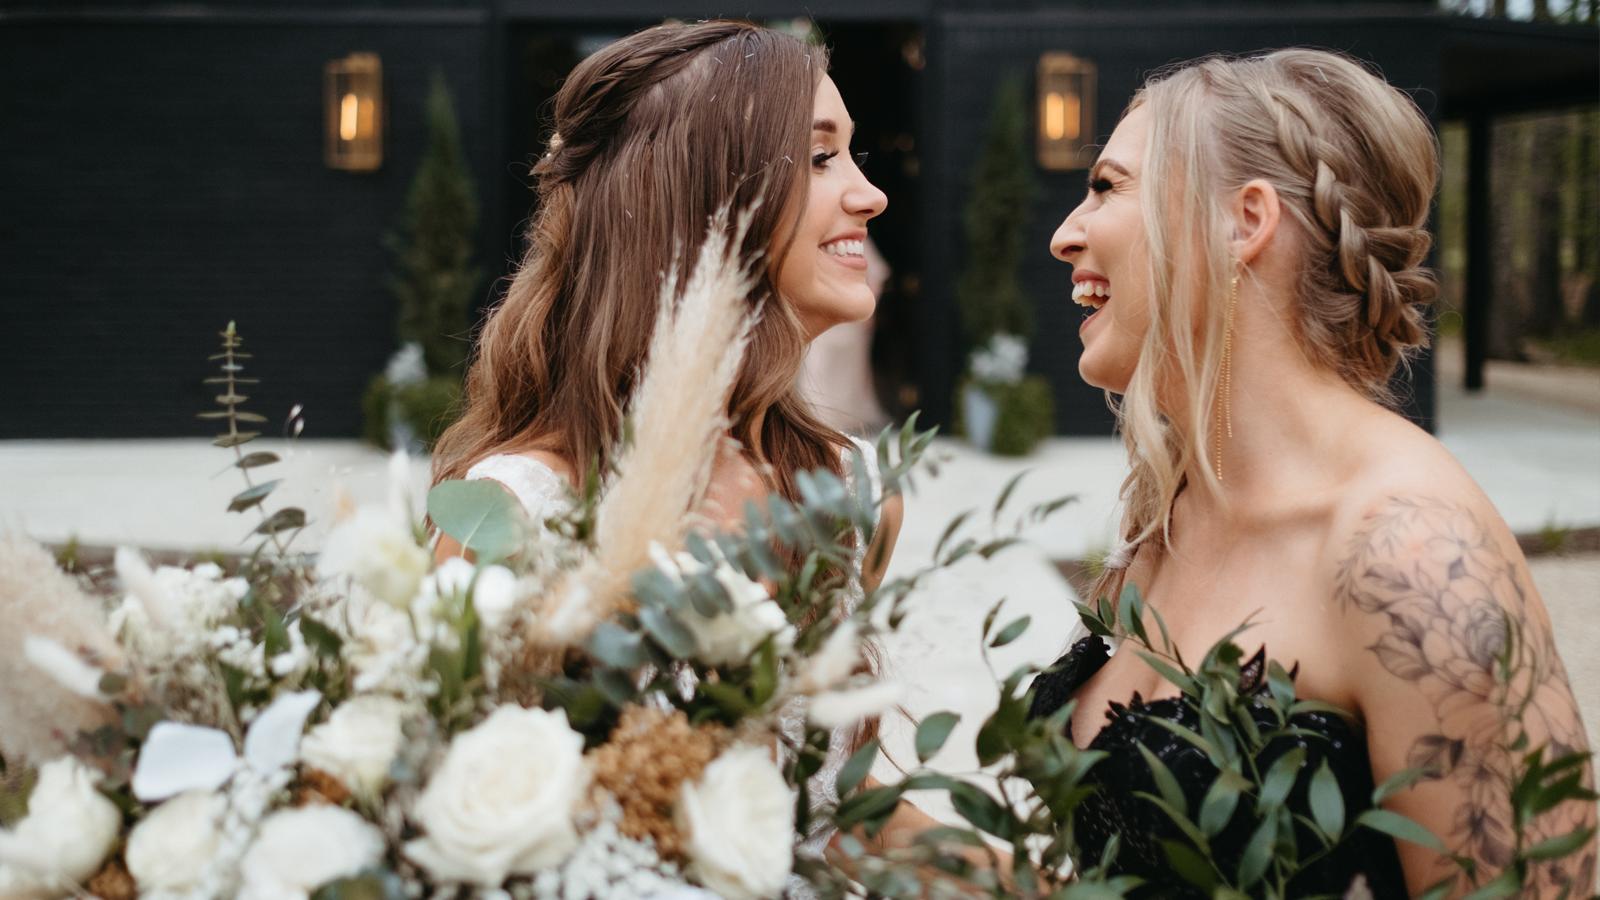 Sarah and Bobbi on their wedding day.